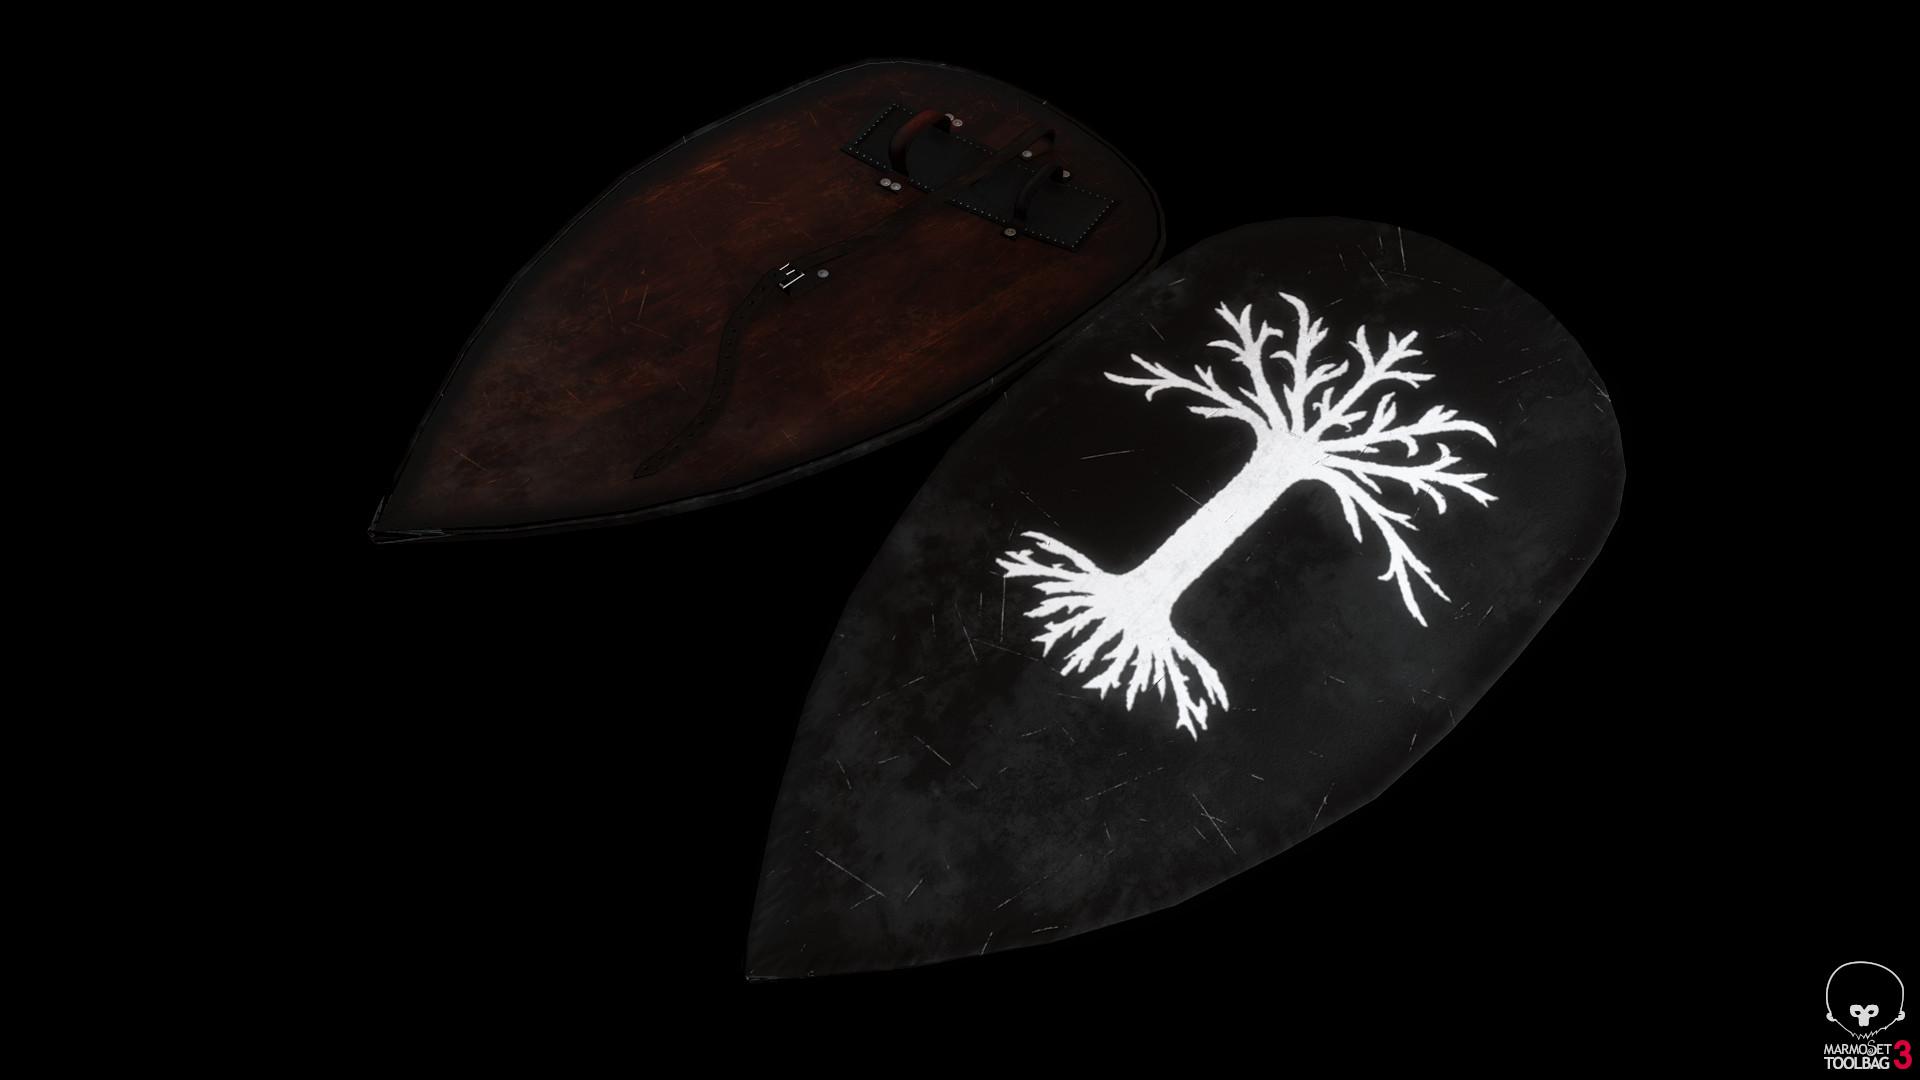 Bela csampai s4h gondorian shield 01 preview mt 01